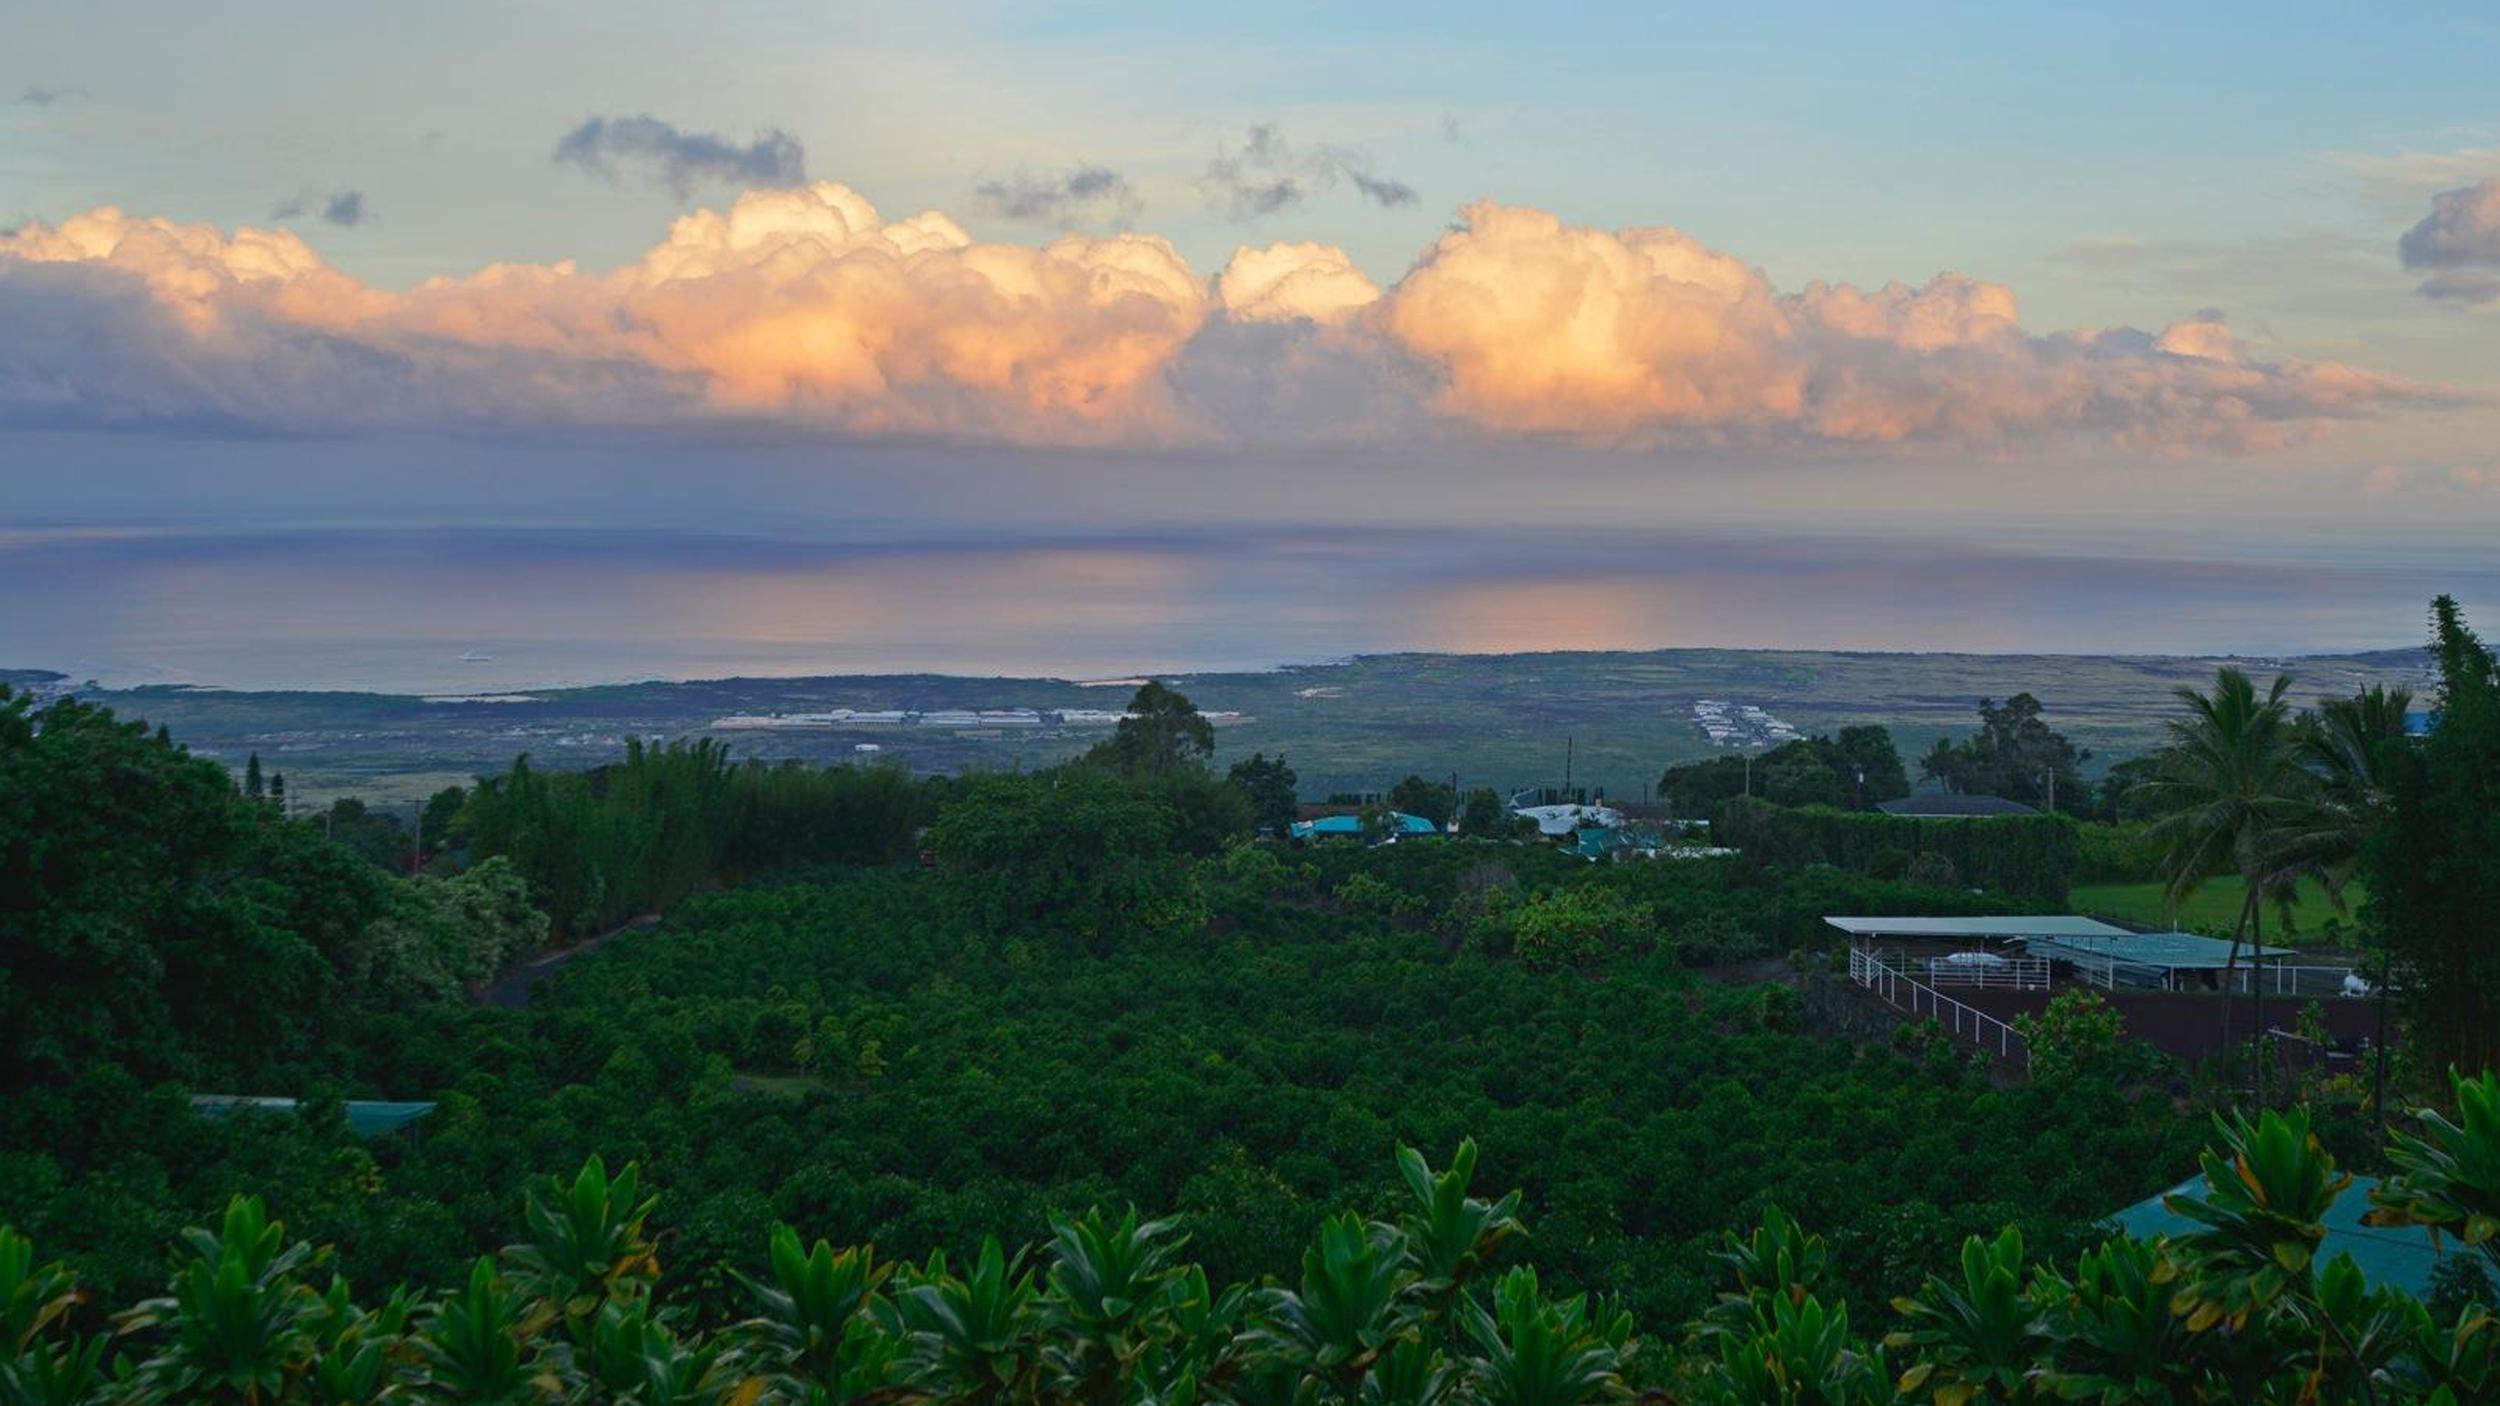 Kailua-Kona Morning